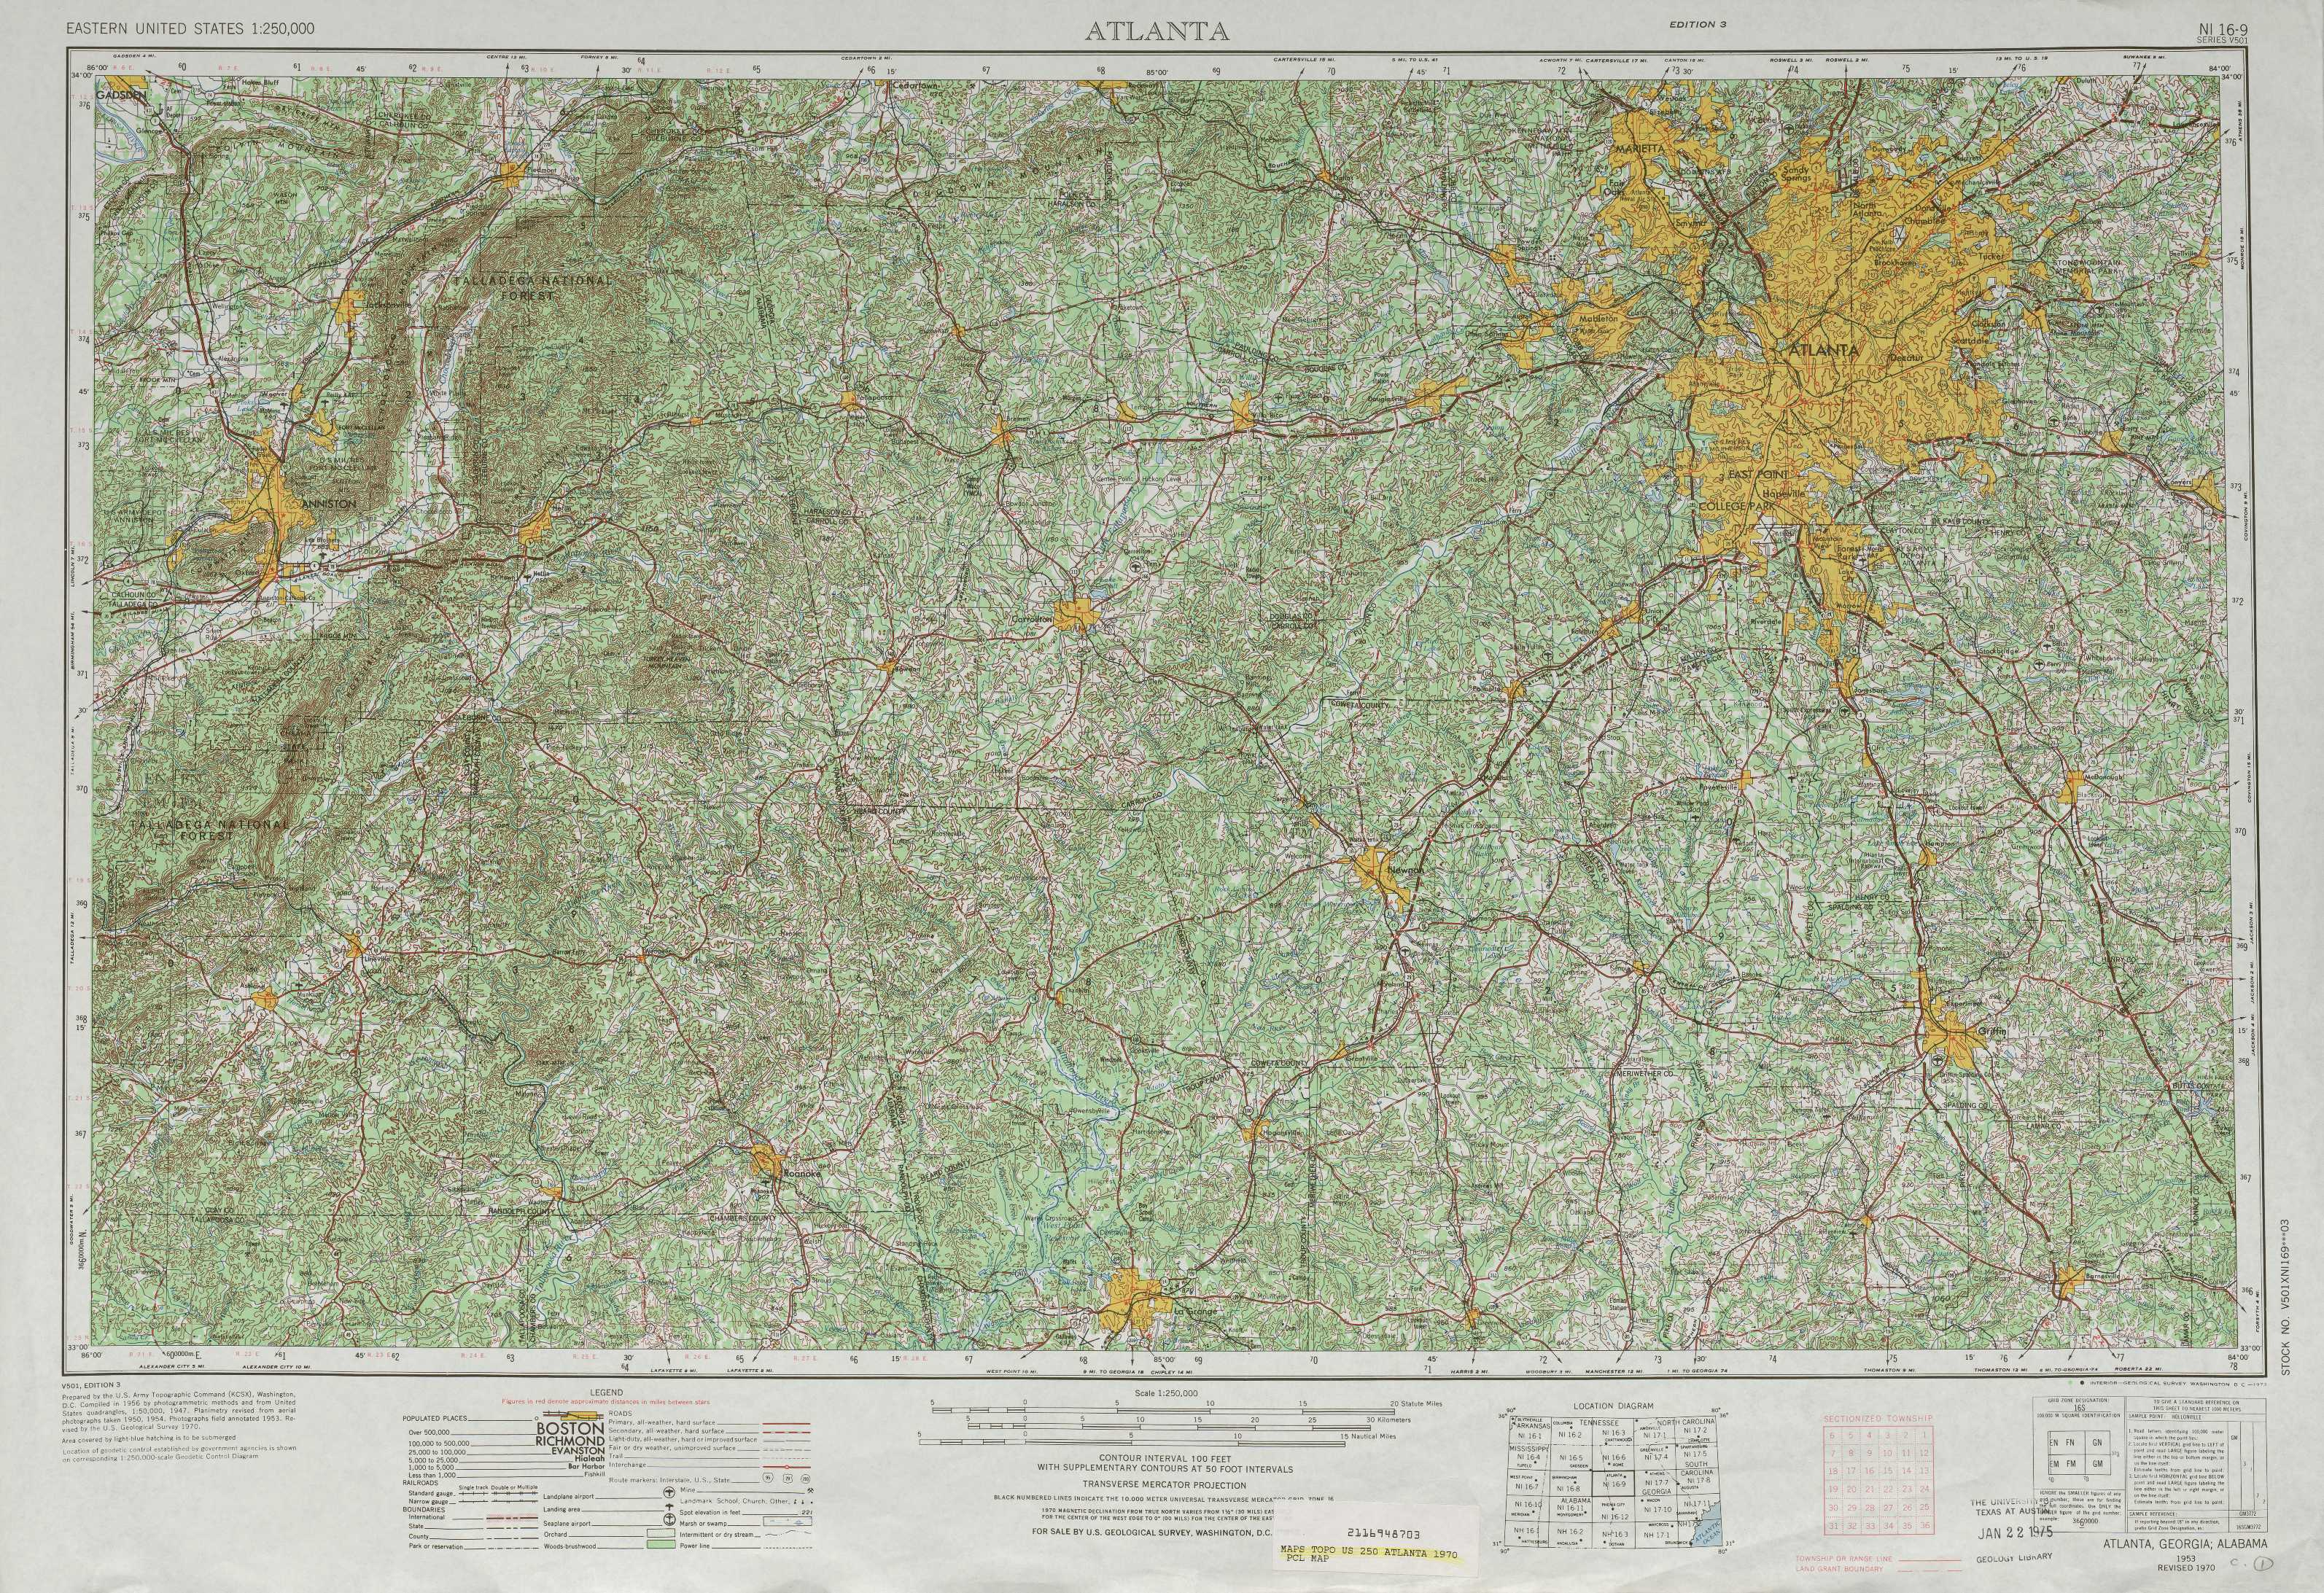 Atlanta topographic maps GA AL USGS Topo Quad 33084a1 at 1